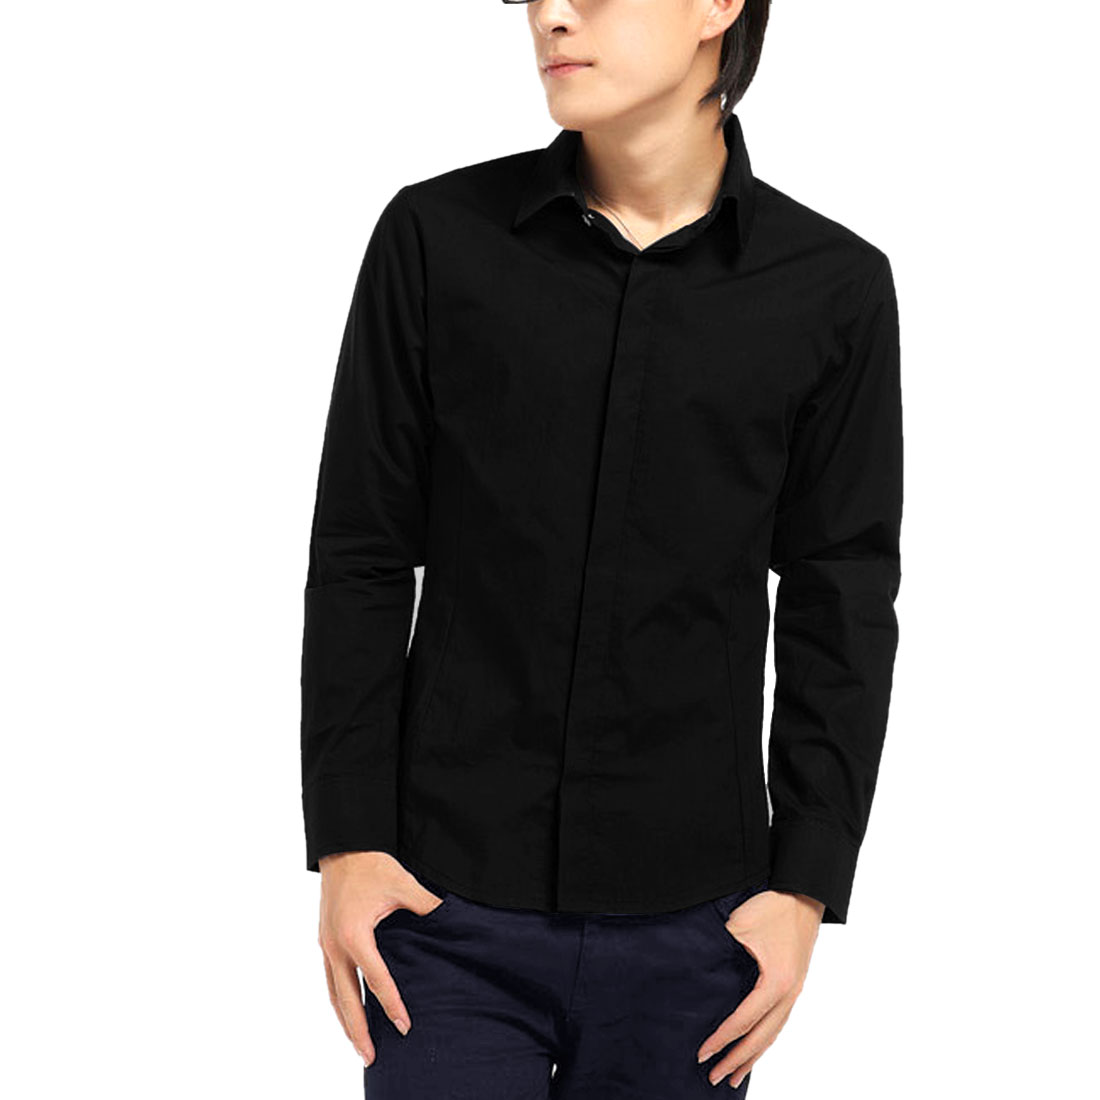 Newly Men Long Sleeve Point Collar Six Button Down Shirt Tops Black L